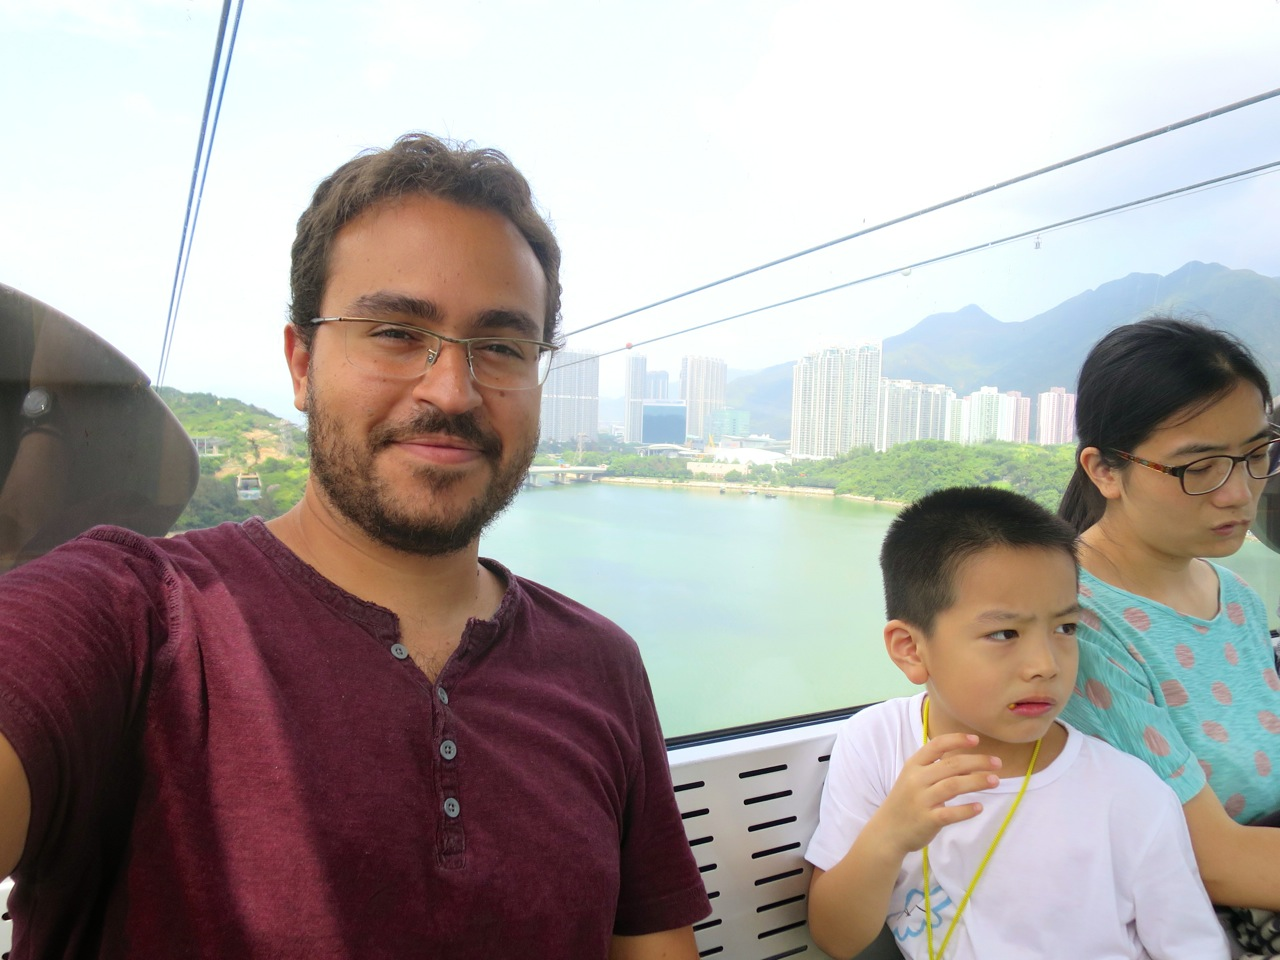 Hong Kong 3 09